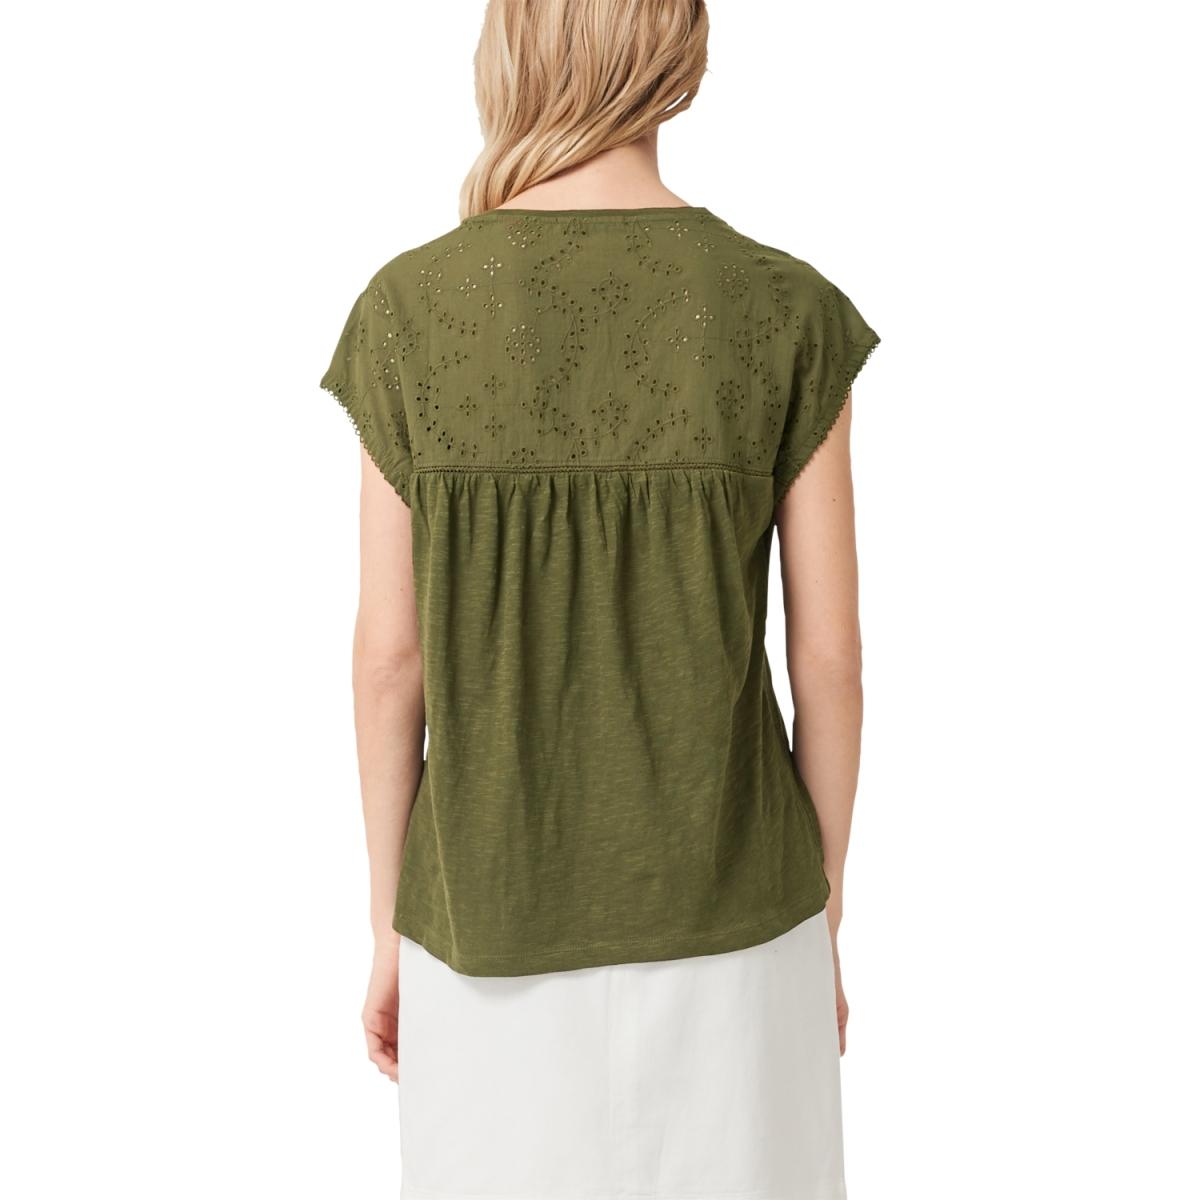 t shirt 14904324208 s.oliver t-shirt 7971